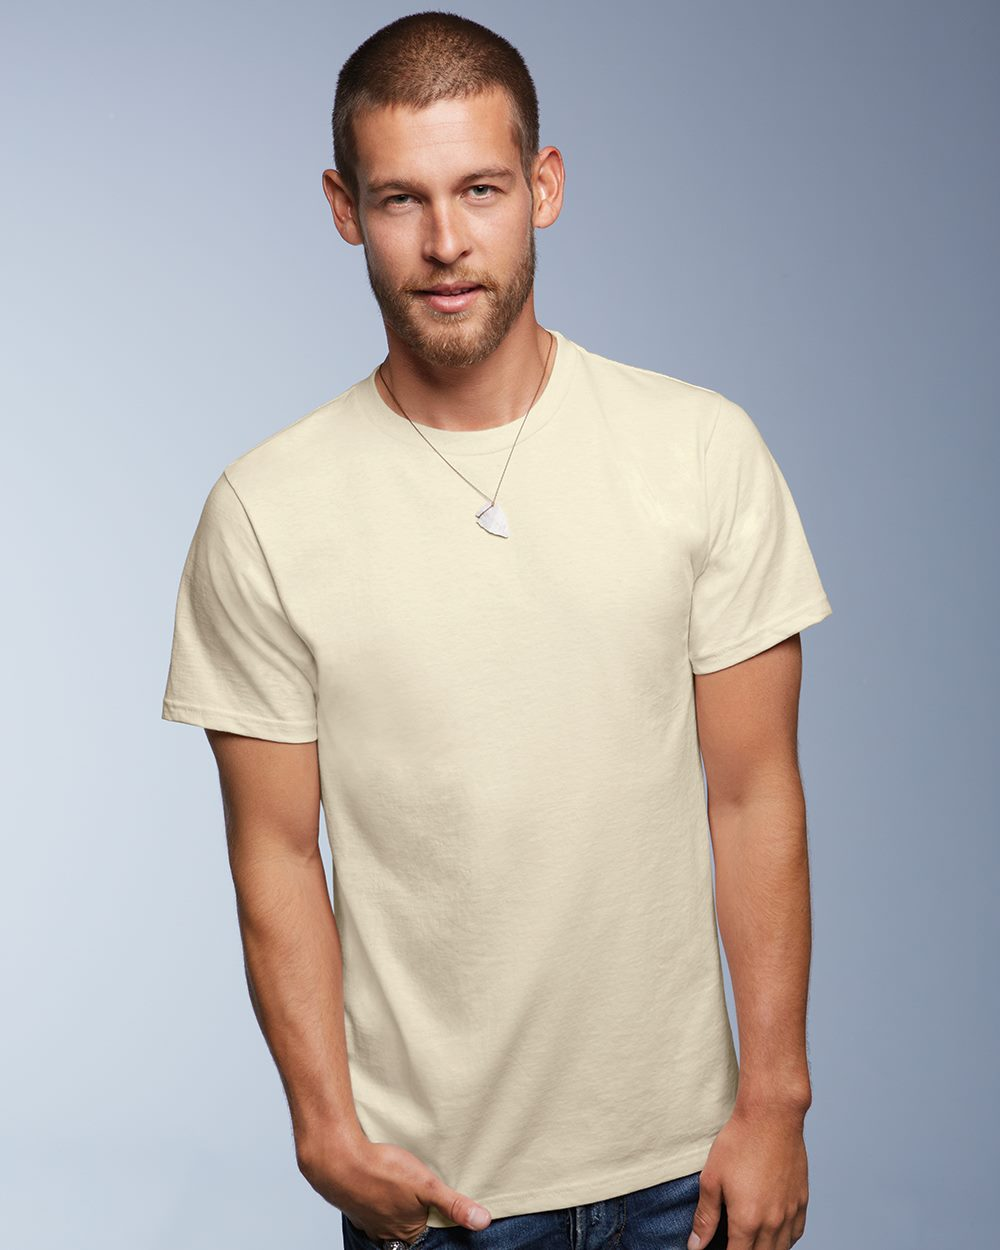 cbaf97c7df38 Anvil 420 - Organic Cotton T-Shirt - Friendly Arctic Printing